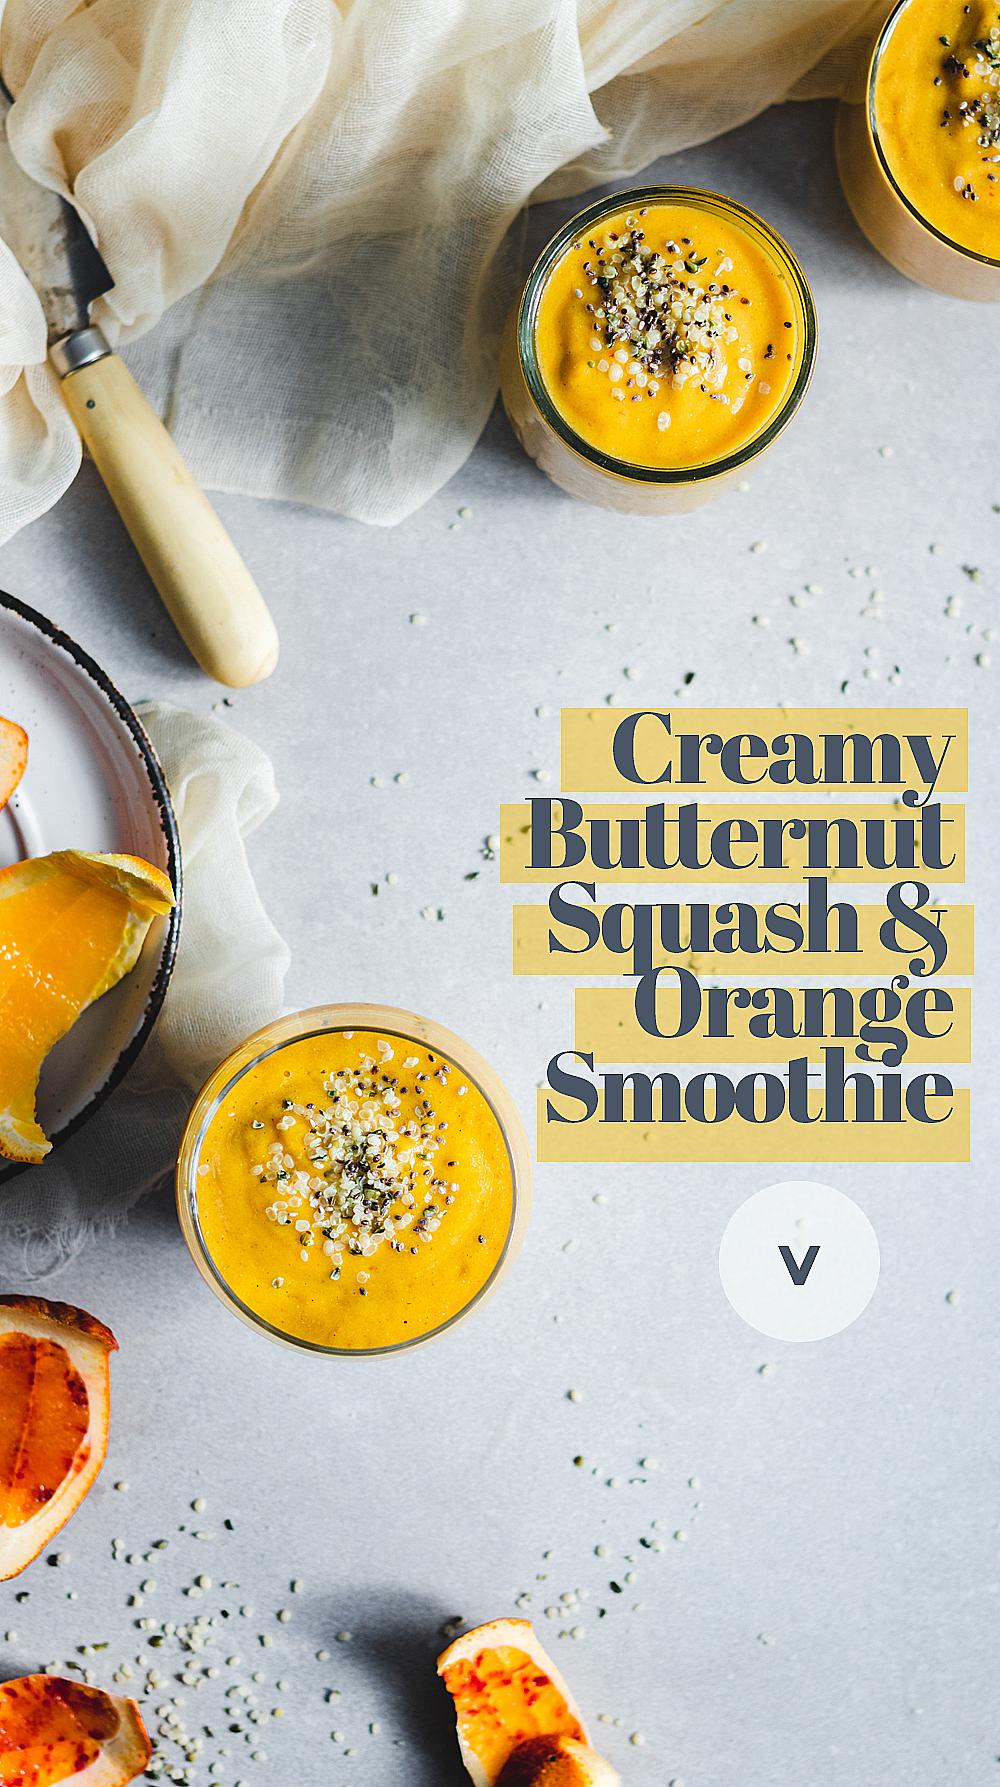 Creamy Butternut Squash and Orange Smoothie